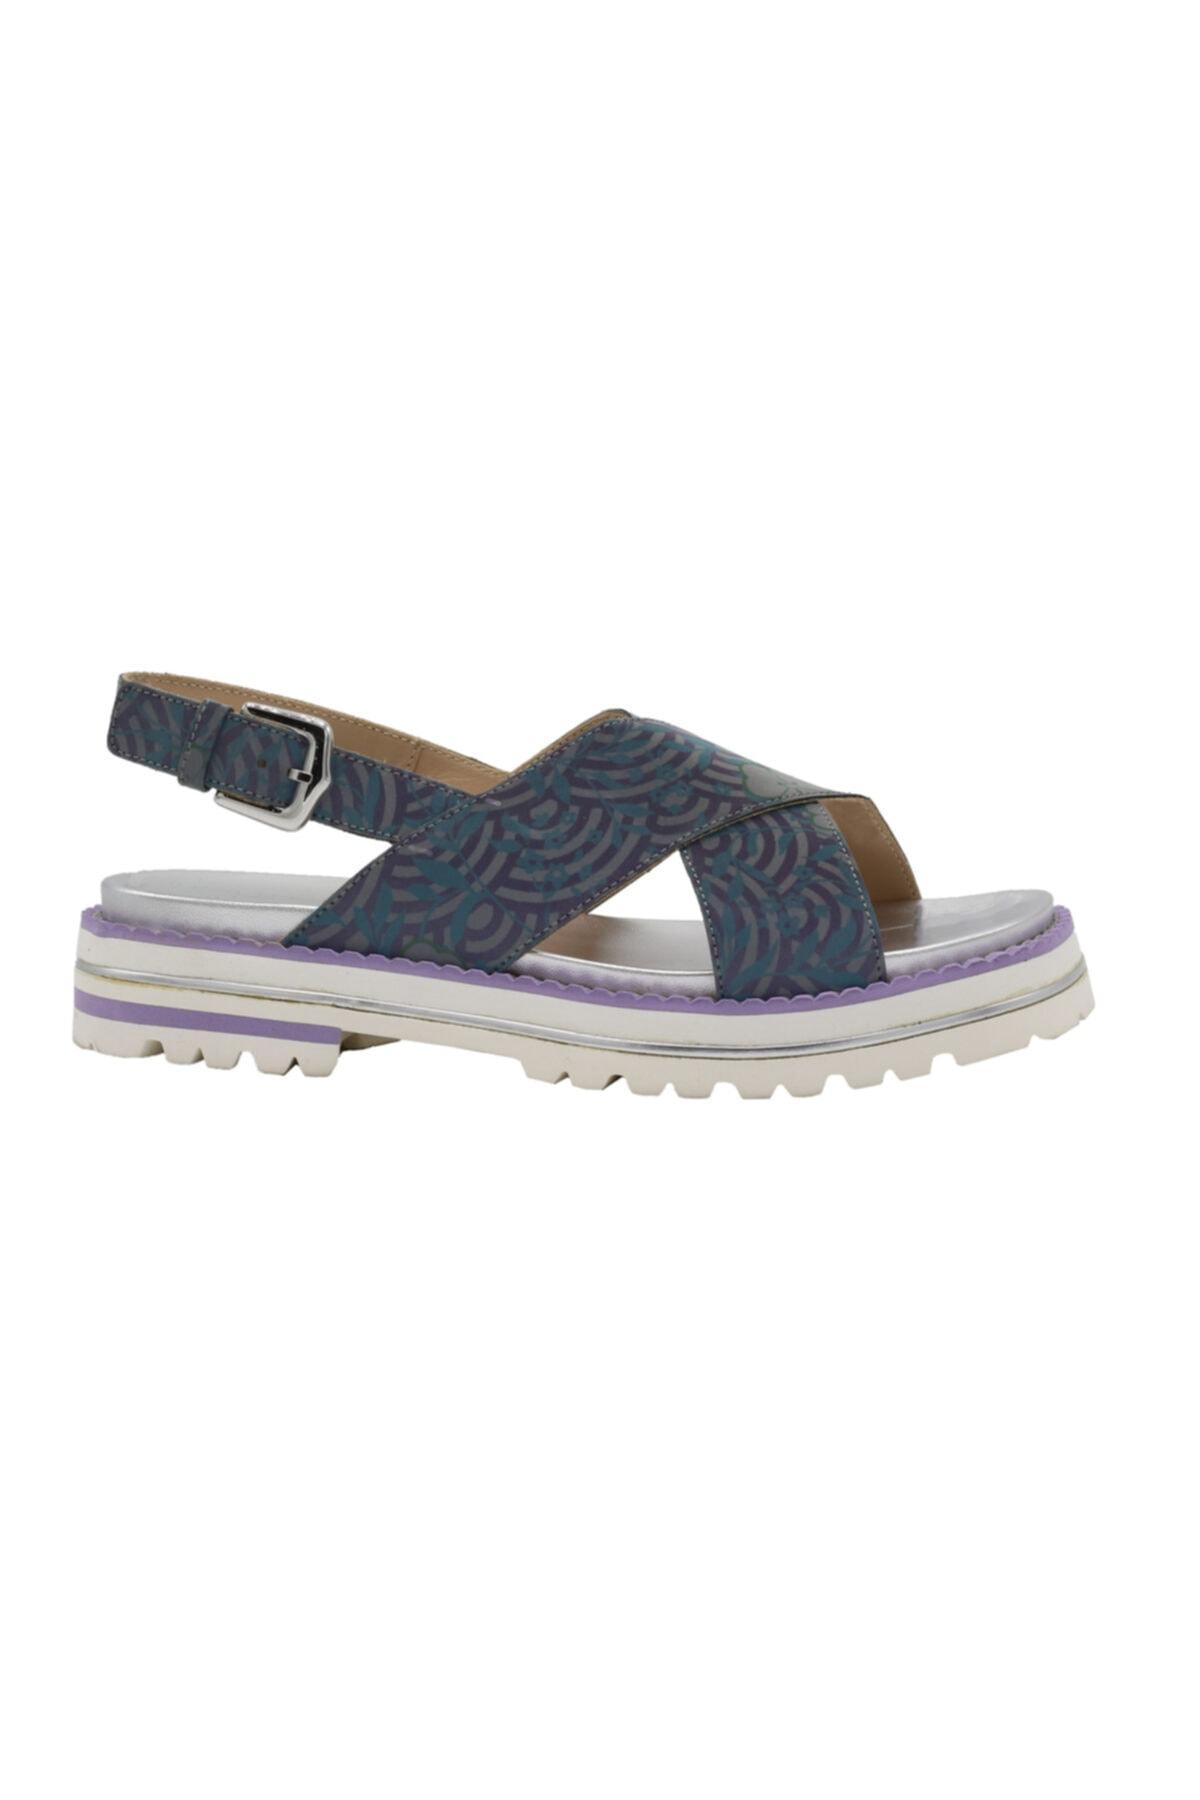 ALBERTO GUARDIANI Hakiki Deri Summer Bayan Ayakkabı 1